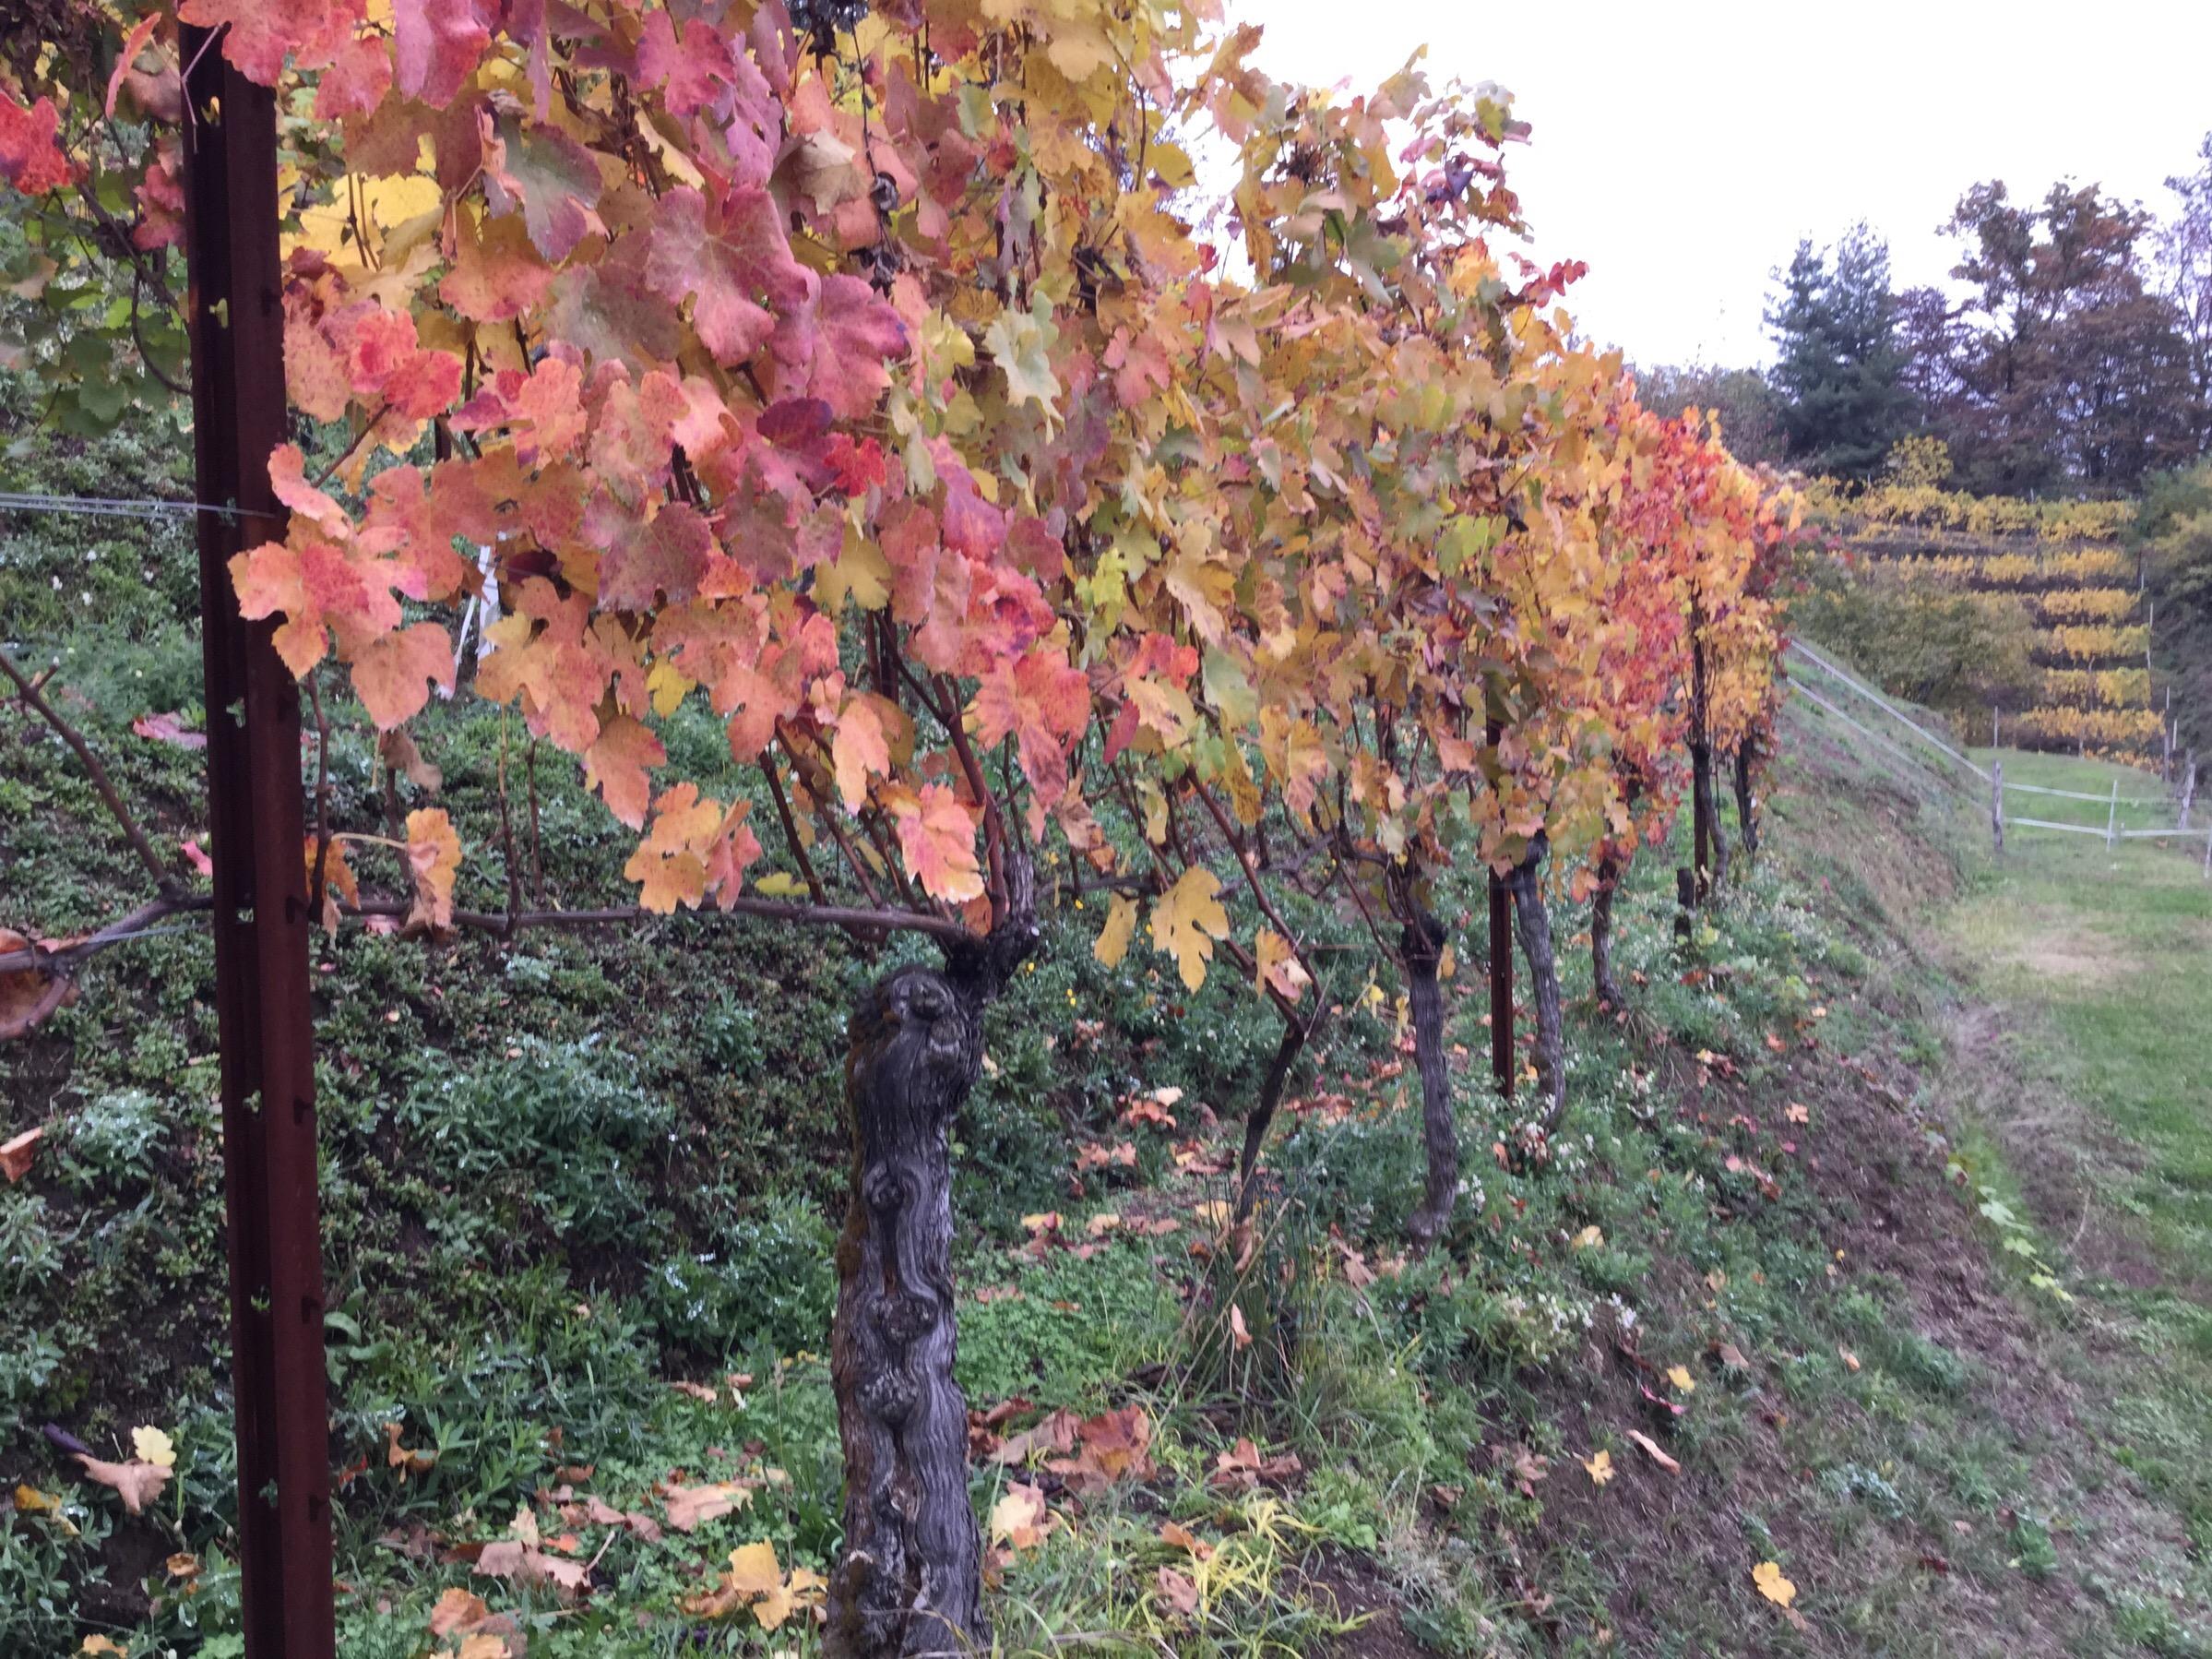 Vineyard in Valdengo